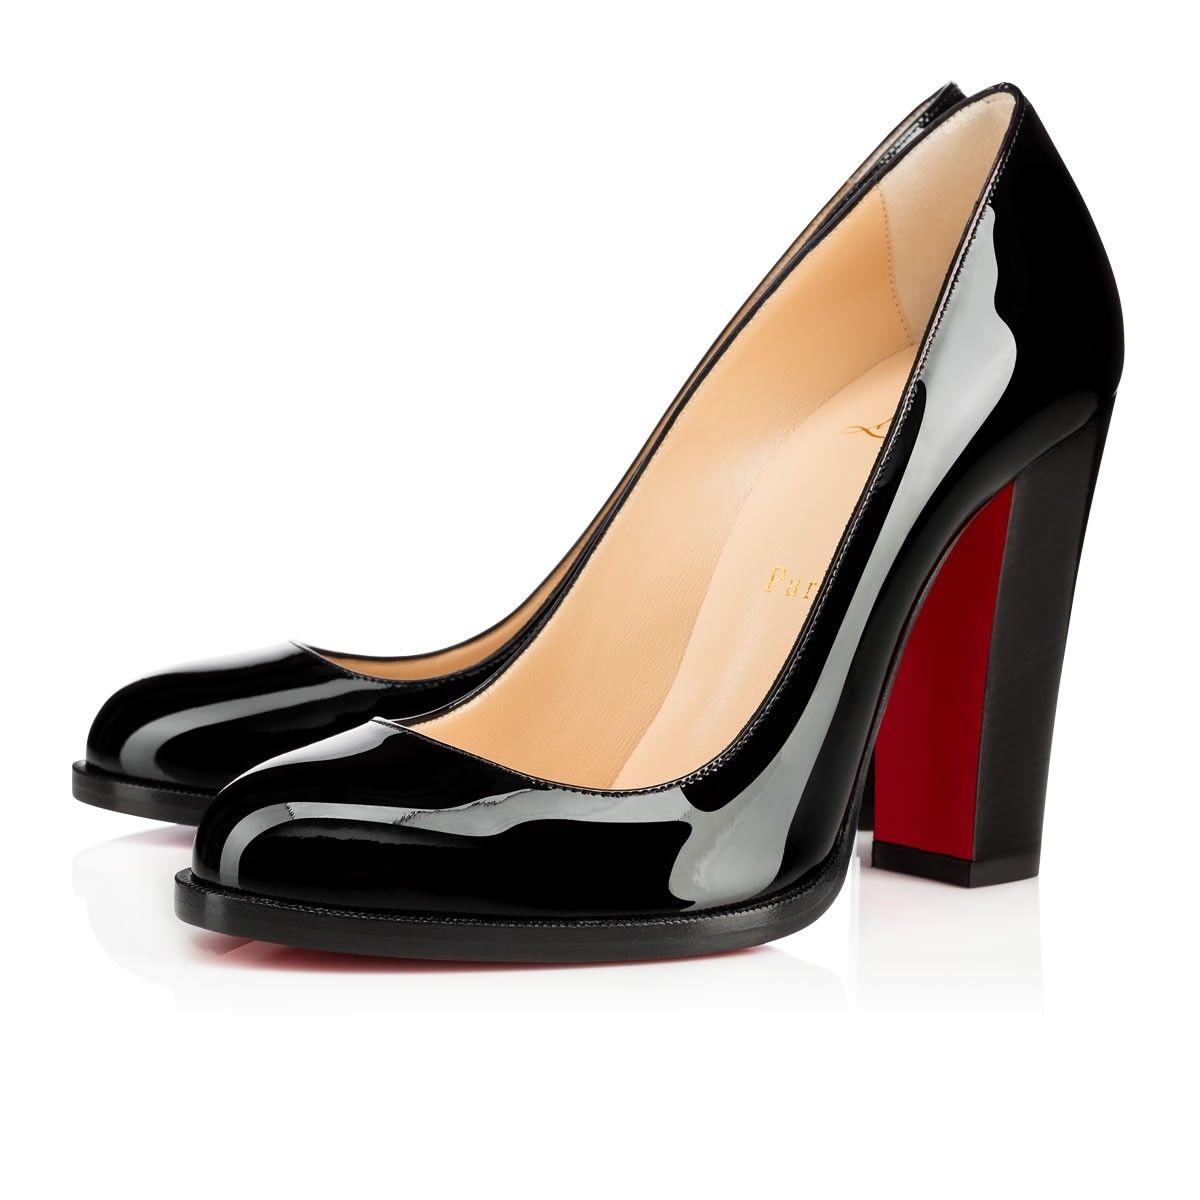 Femmes BC Footwear Chaussures À Talons OWv7d3hlLE